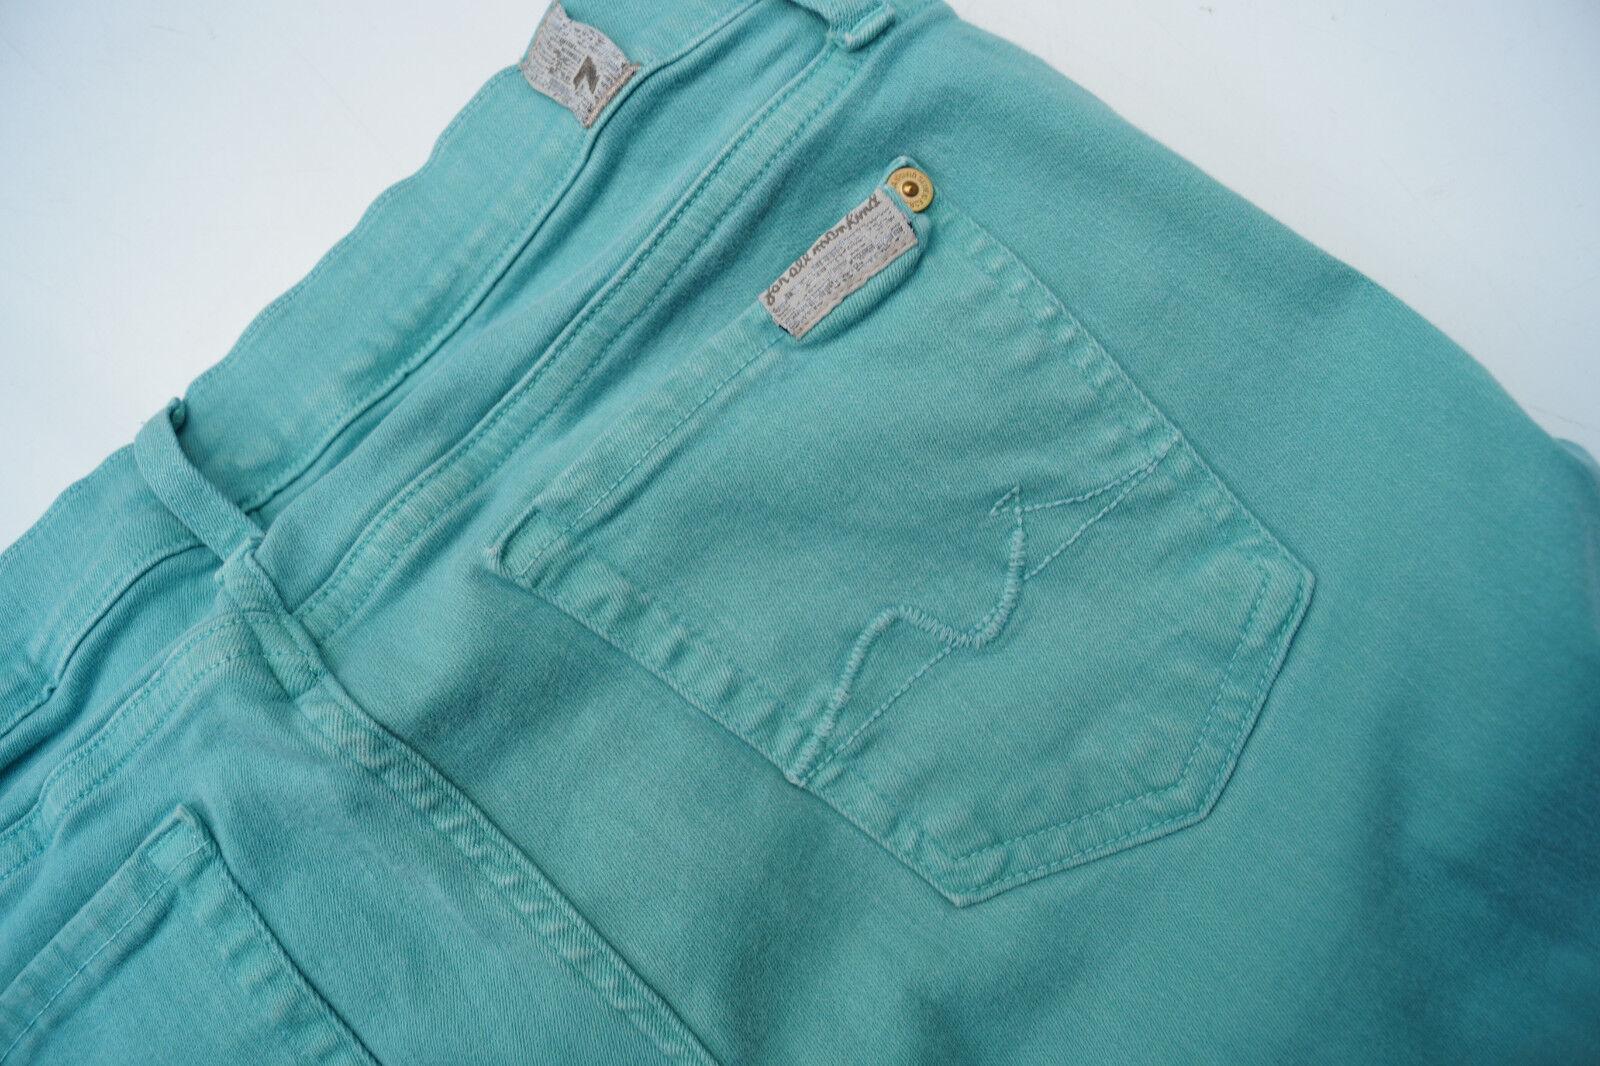 7 SEVEN FOR ALL MANKIND skinny Damen stretch Jeans Hose 27 30 W27 L30 mintgrün v